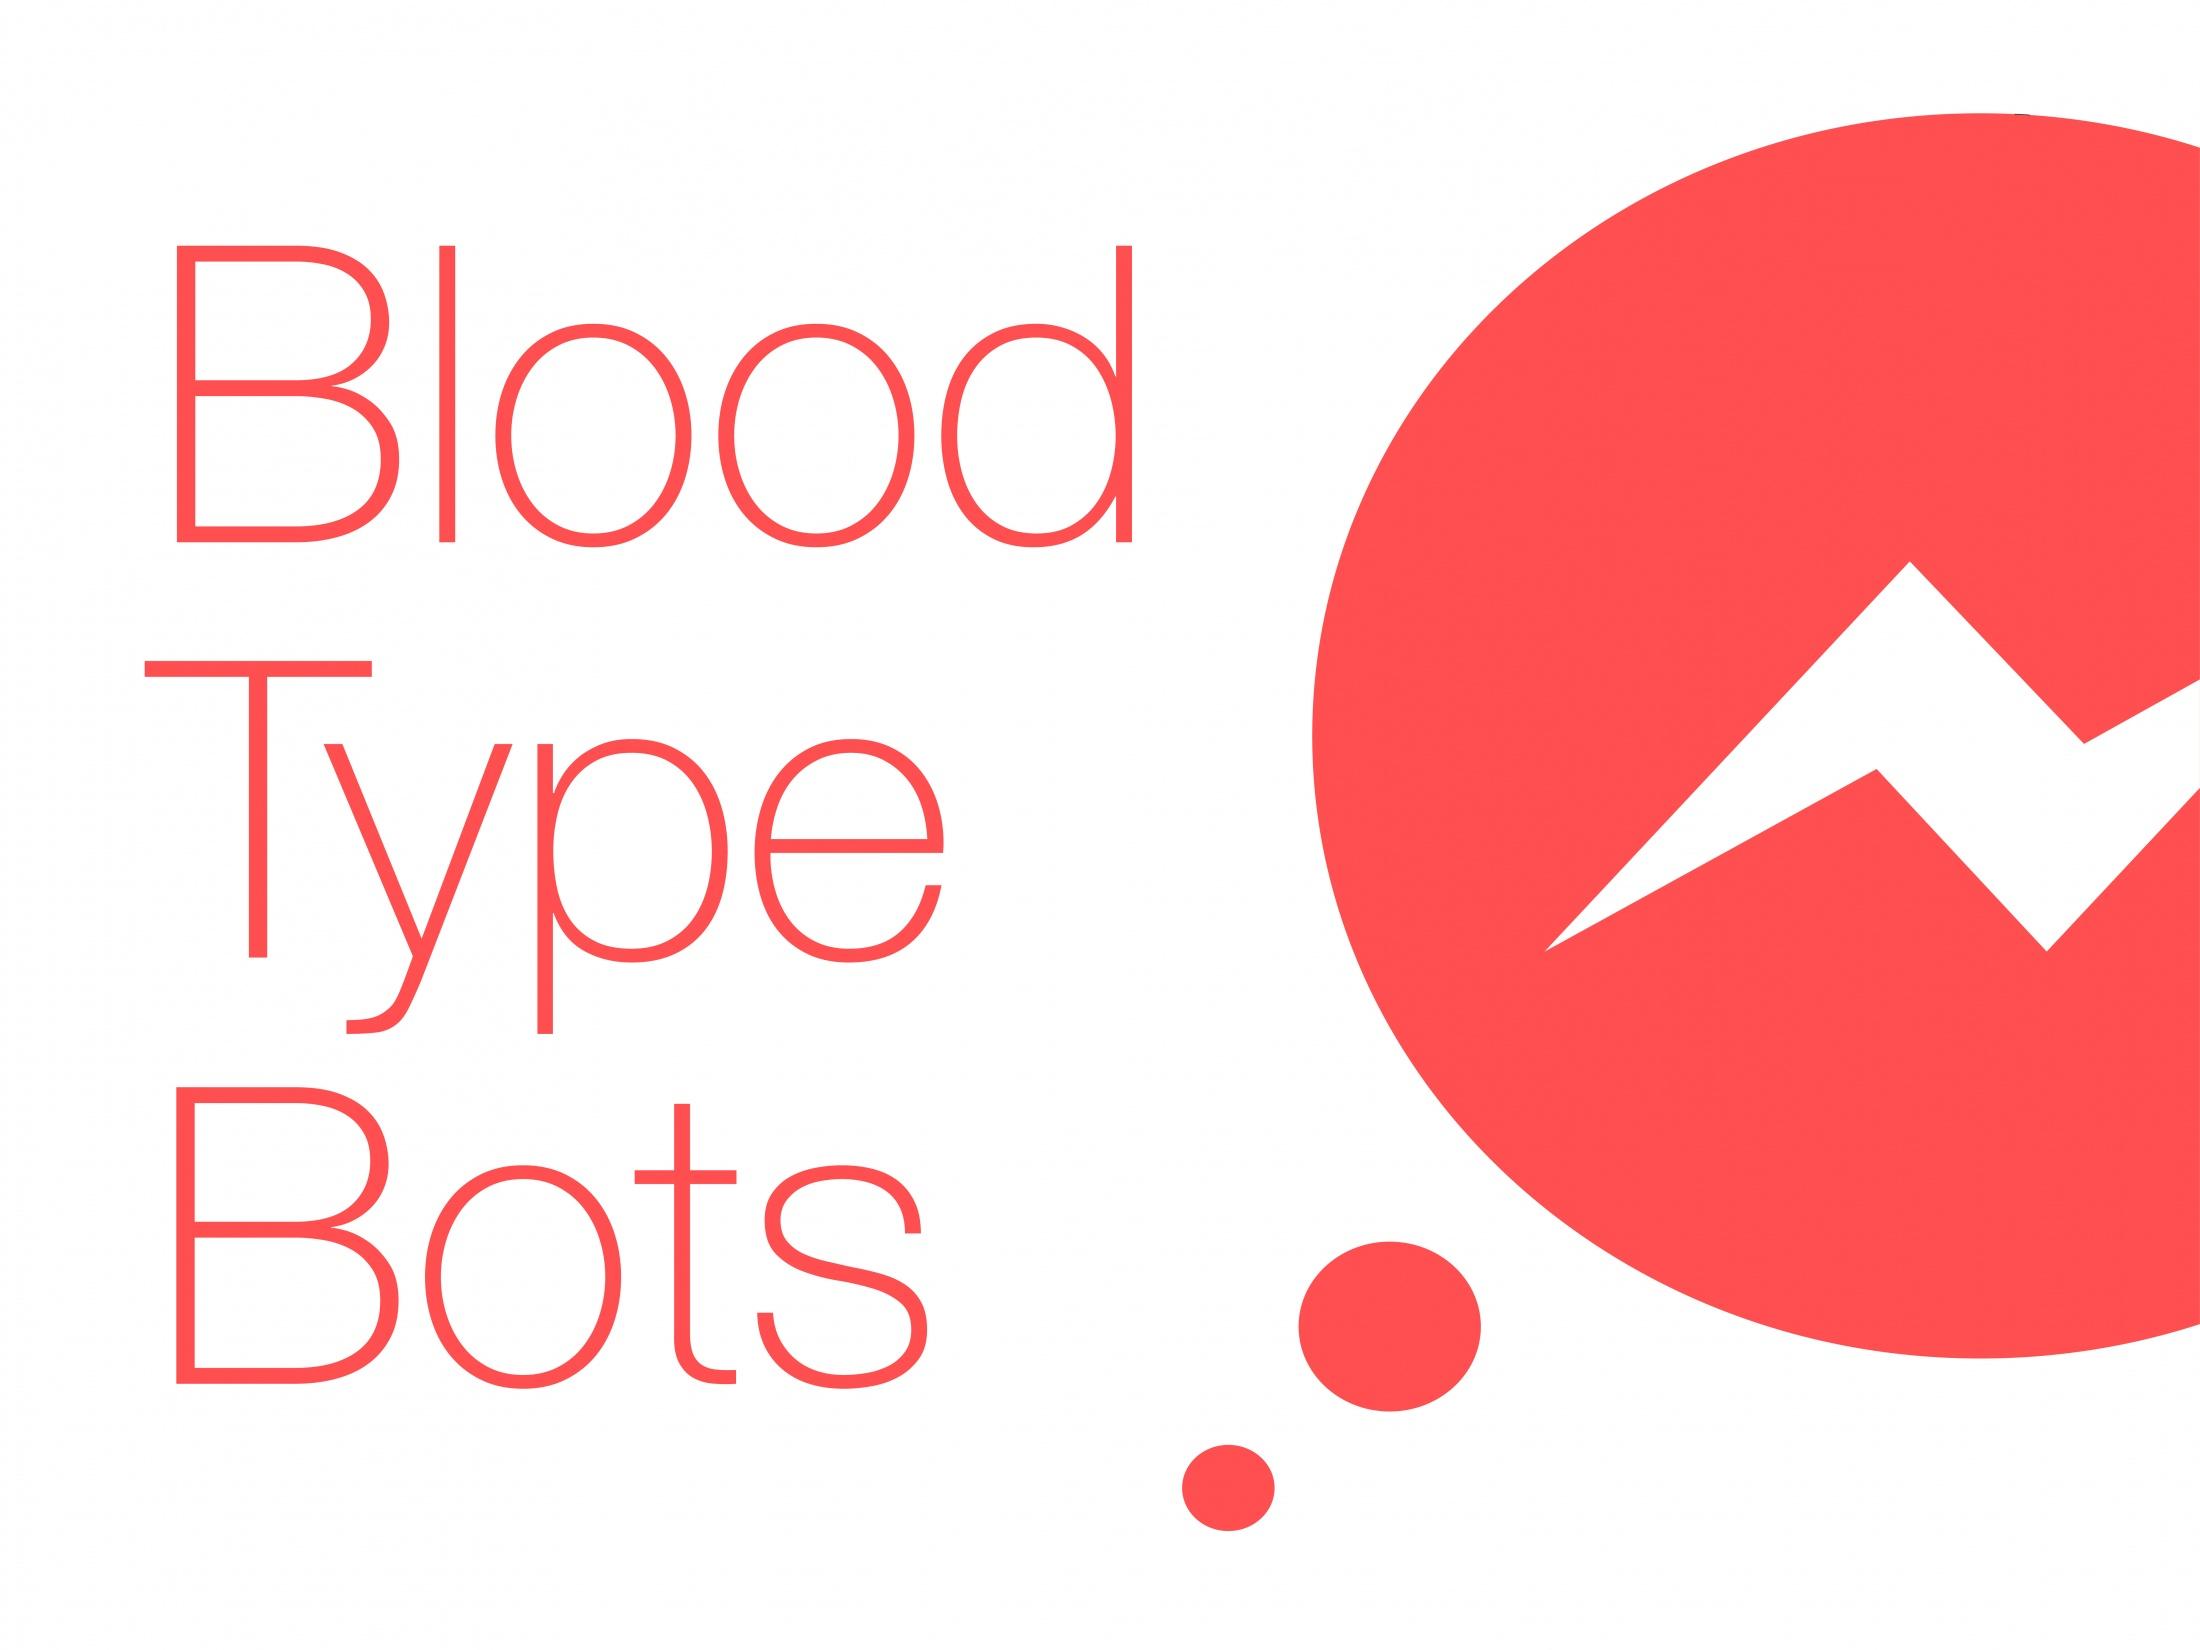 Facebook Messenger's Blood Type Bots Thumbnail